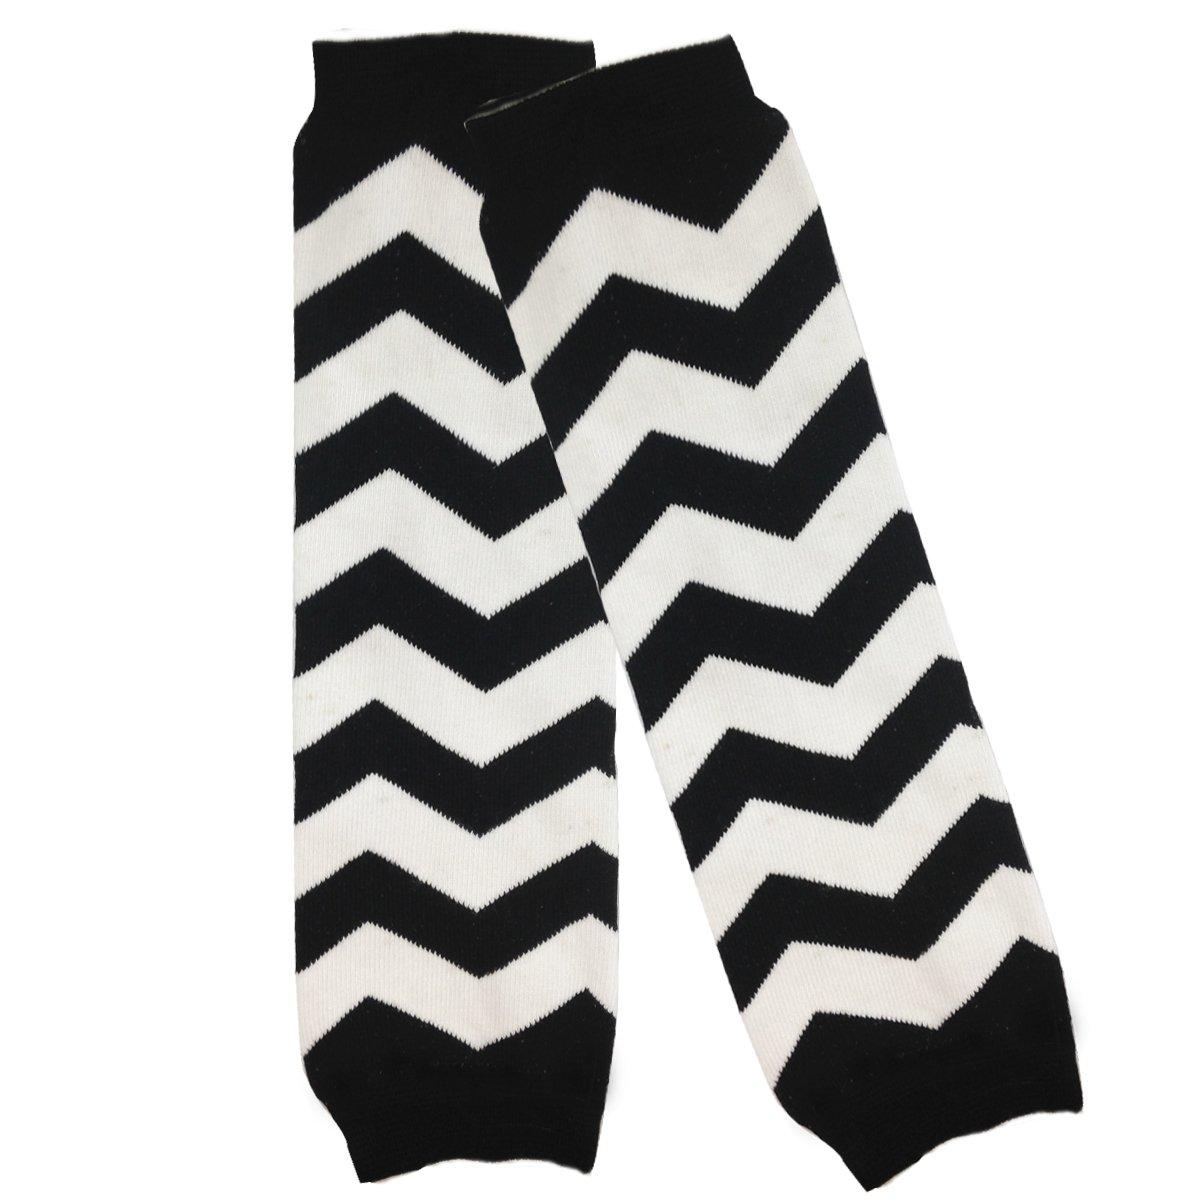 Bowbear Baby Stripes and Chevron Leg Warmers Black and White C 1002_B67156c_AFN